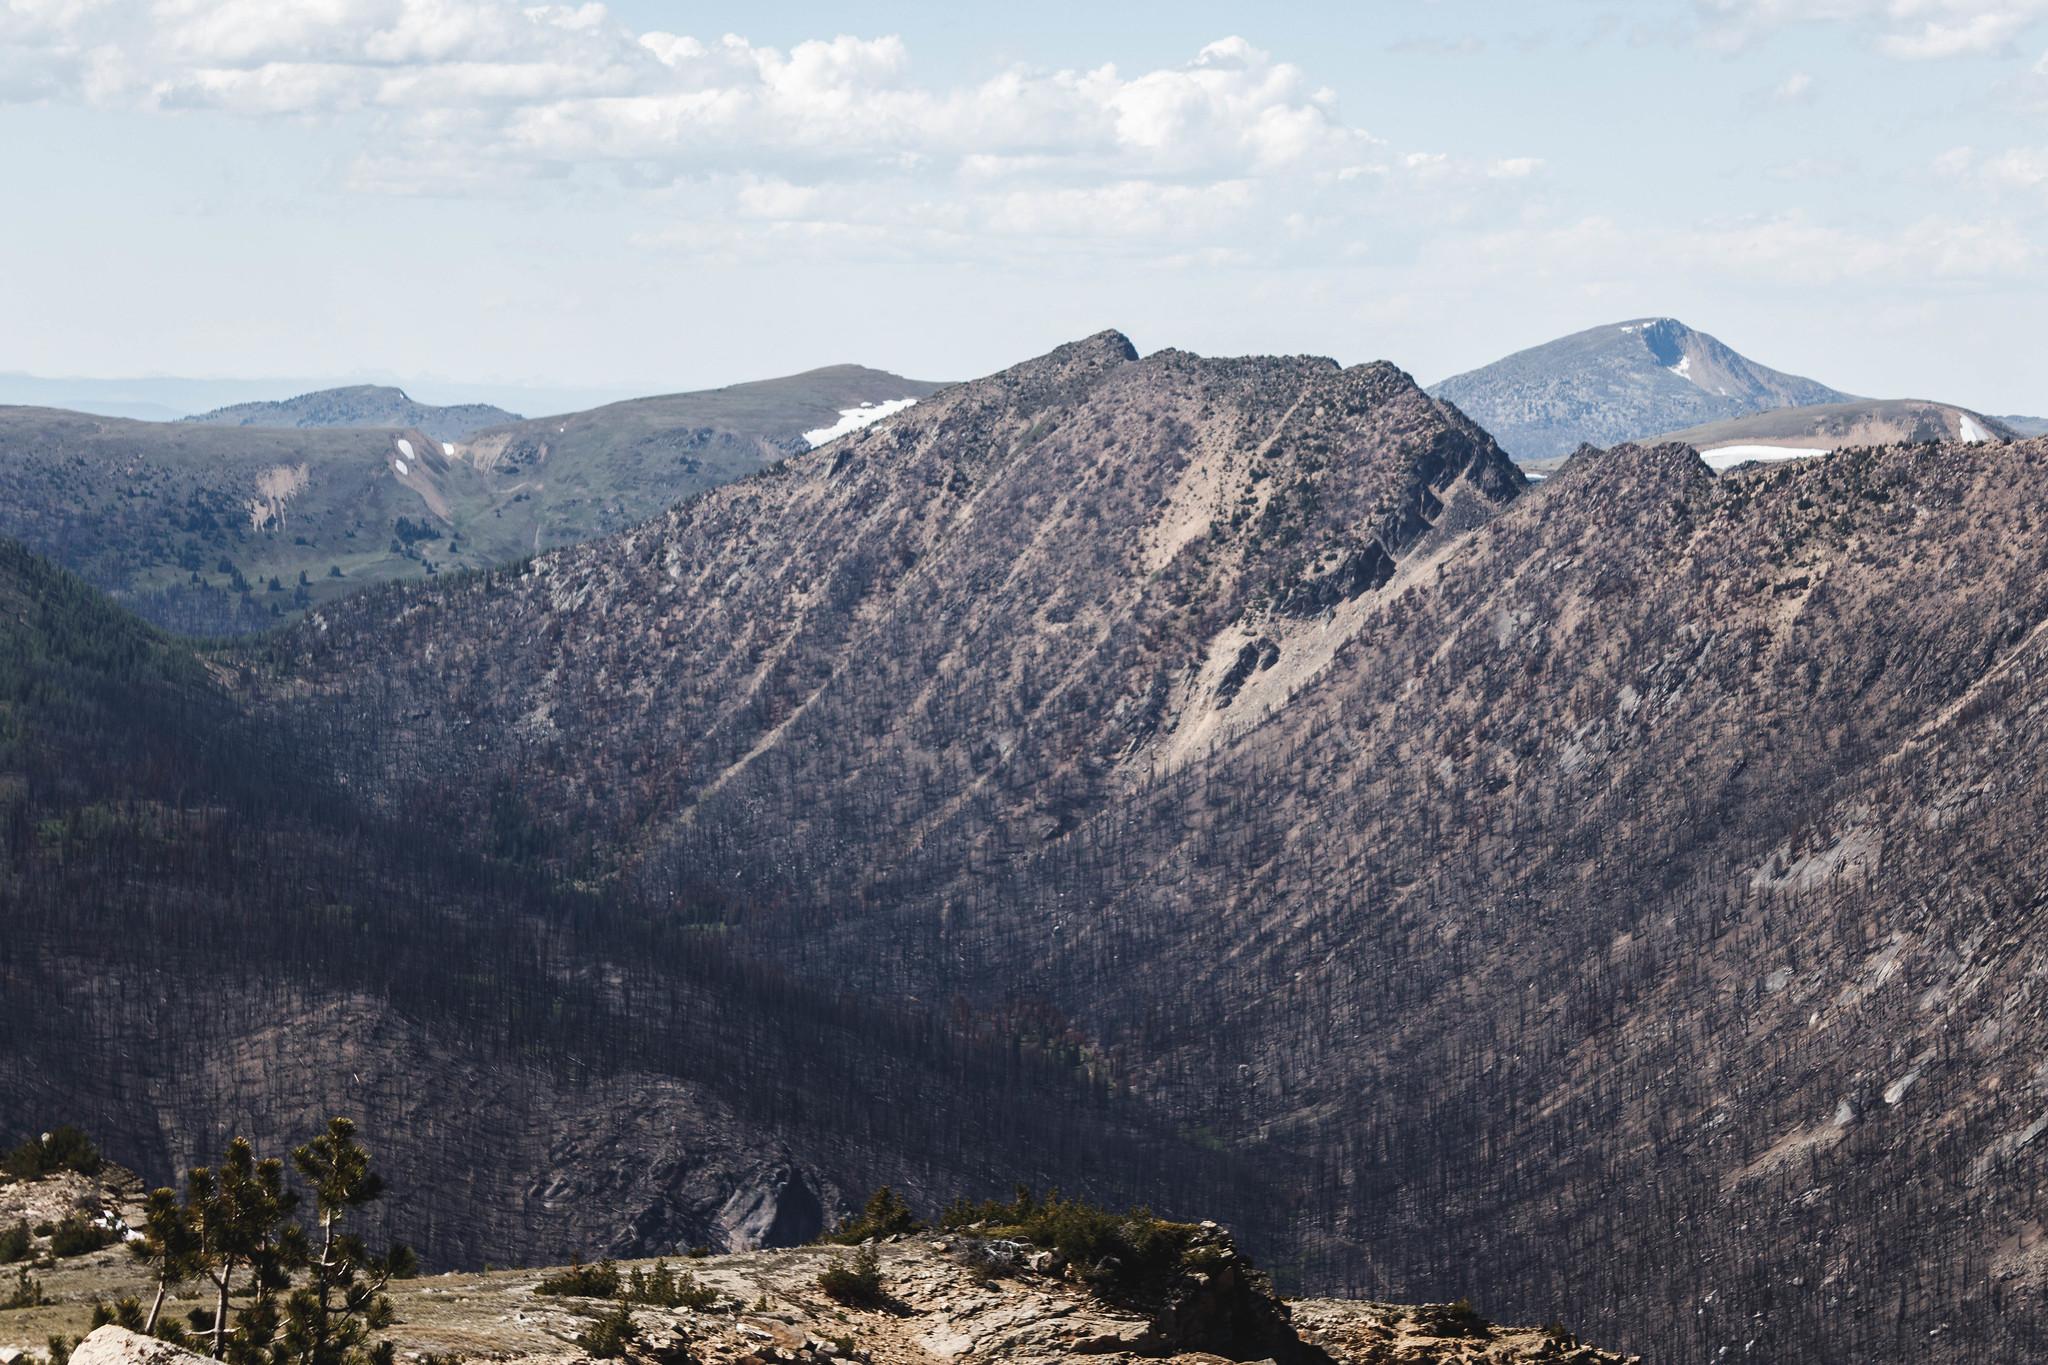 Corral Peak